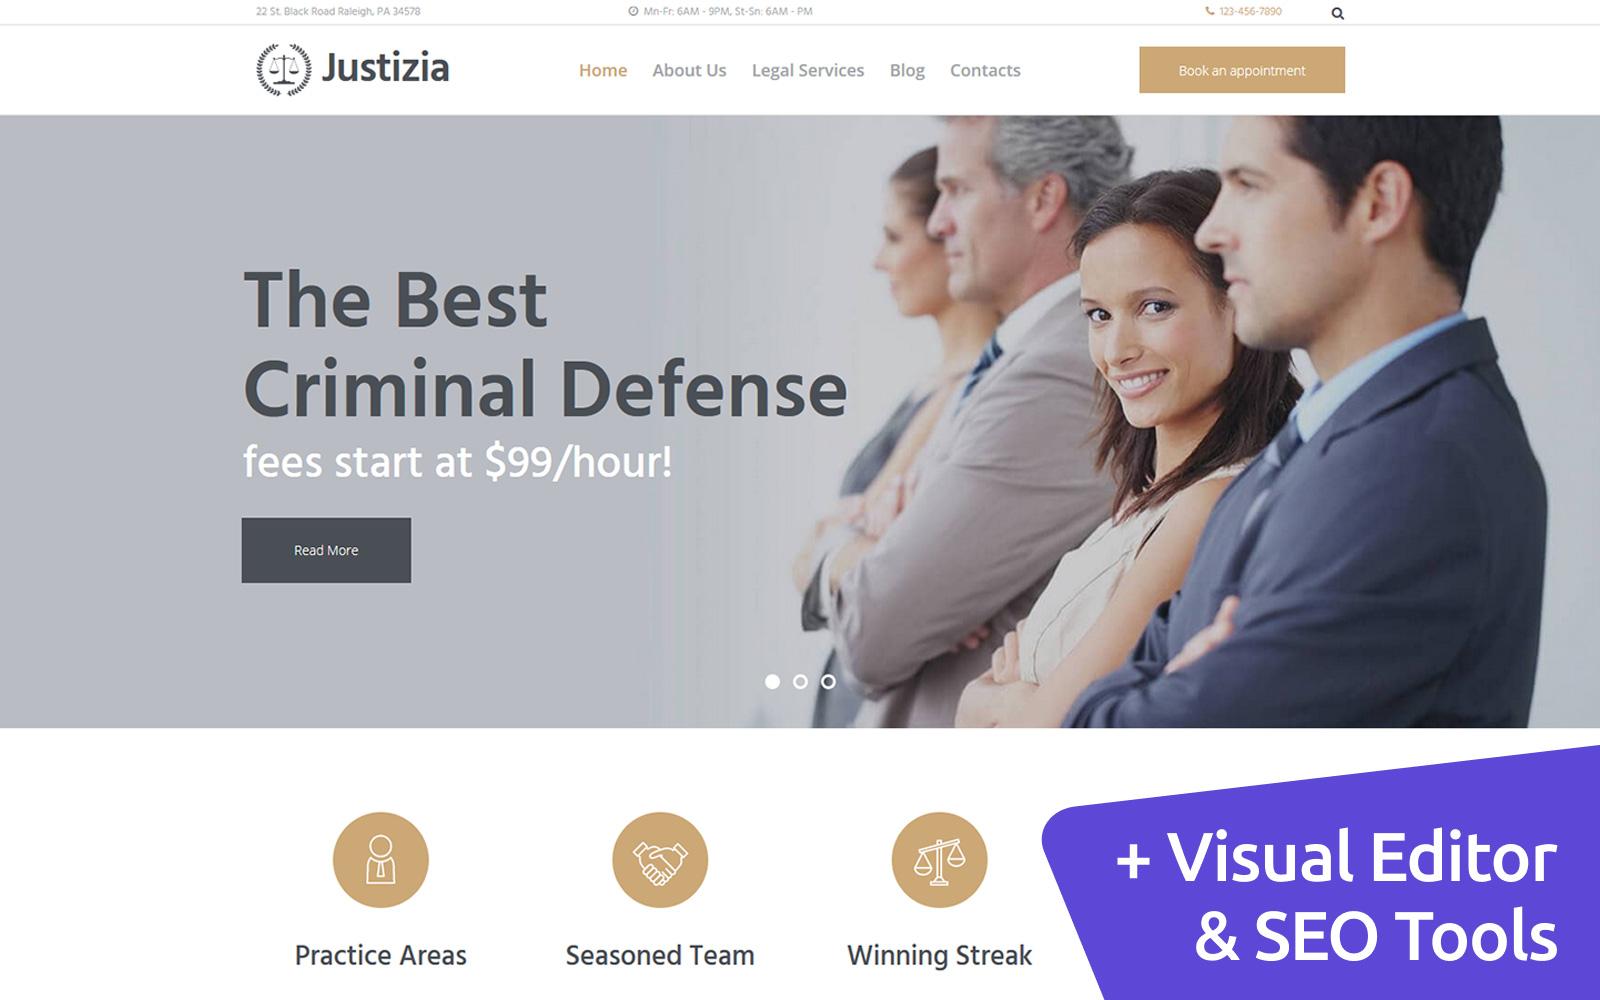 Justizia - Lawyer Services Templates Moto CMS 3 №112021